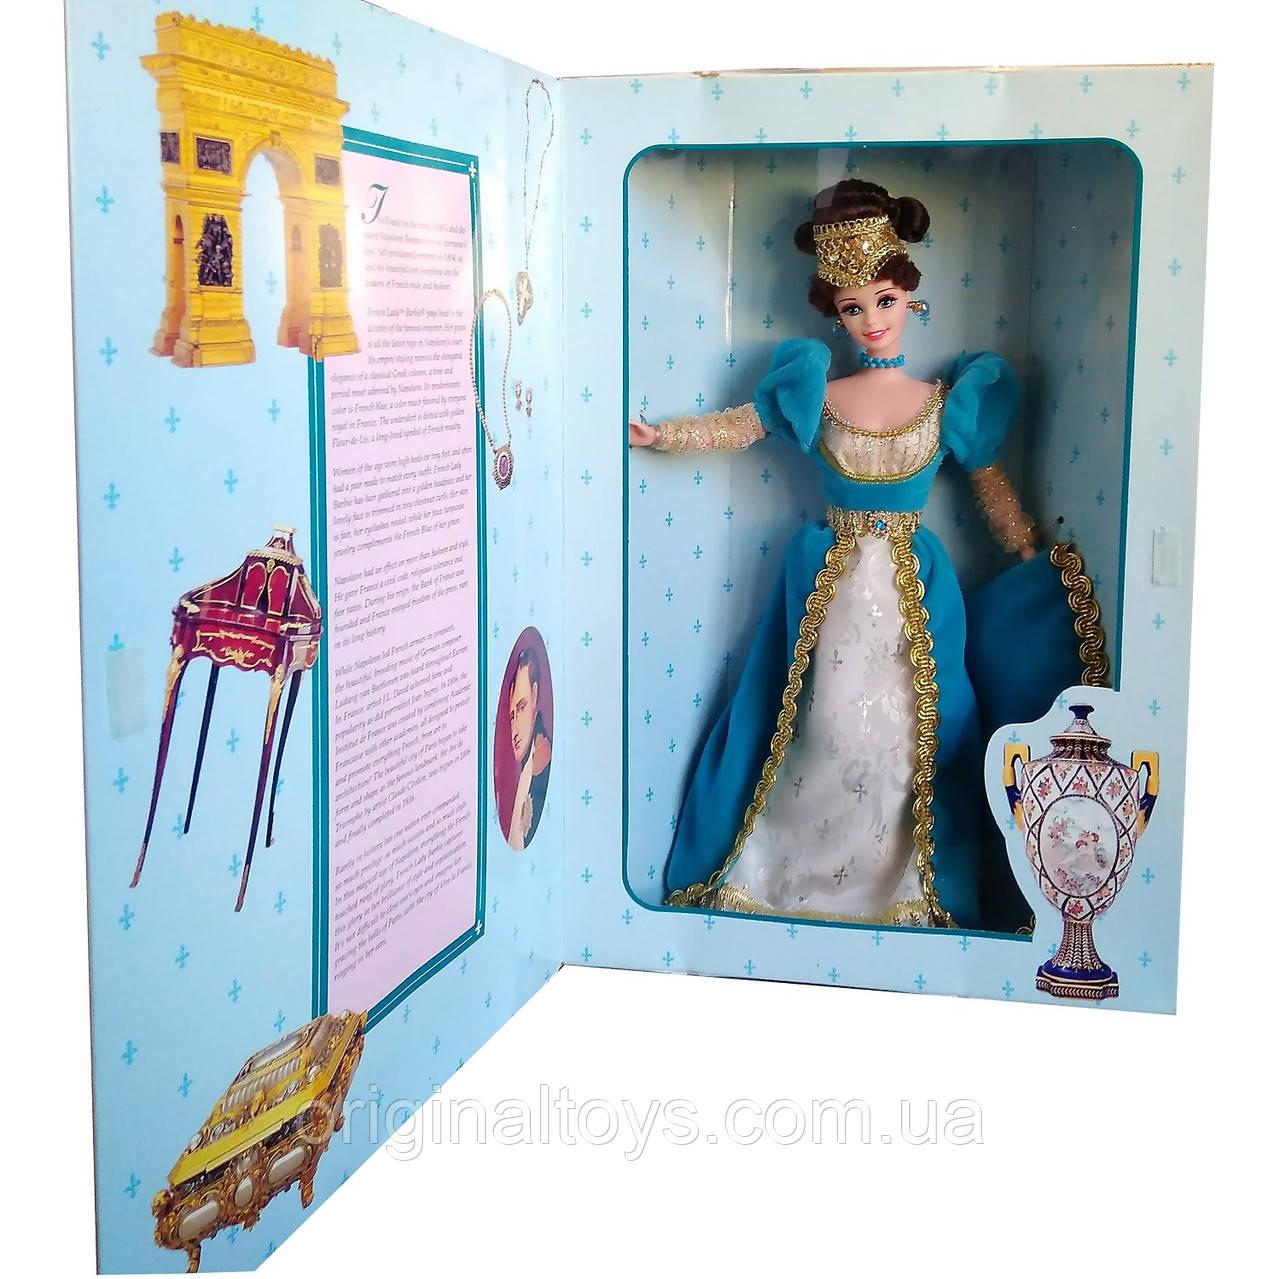 Коллекционная кукла Барби Французская Леди Barbie French Lady 1996 Mattel 16707